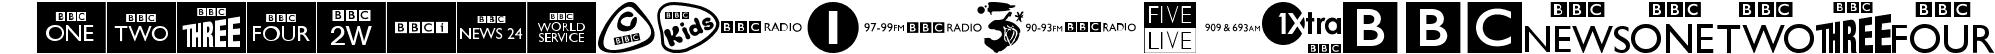 BBC TV Channel Logos